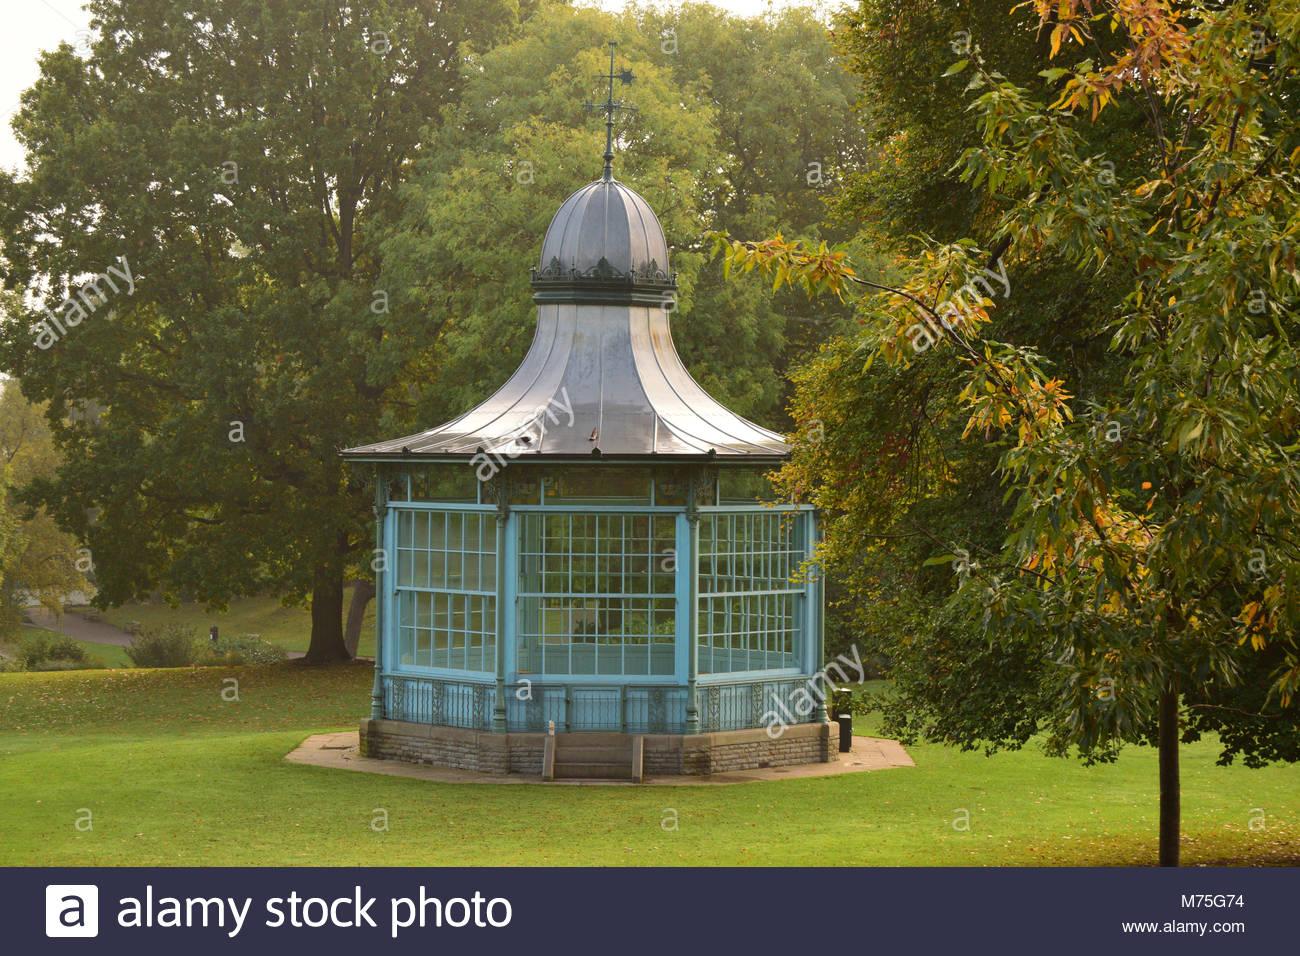 Weston park bandstand,Sheffield,2016 - Stock Image